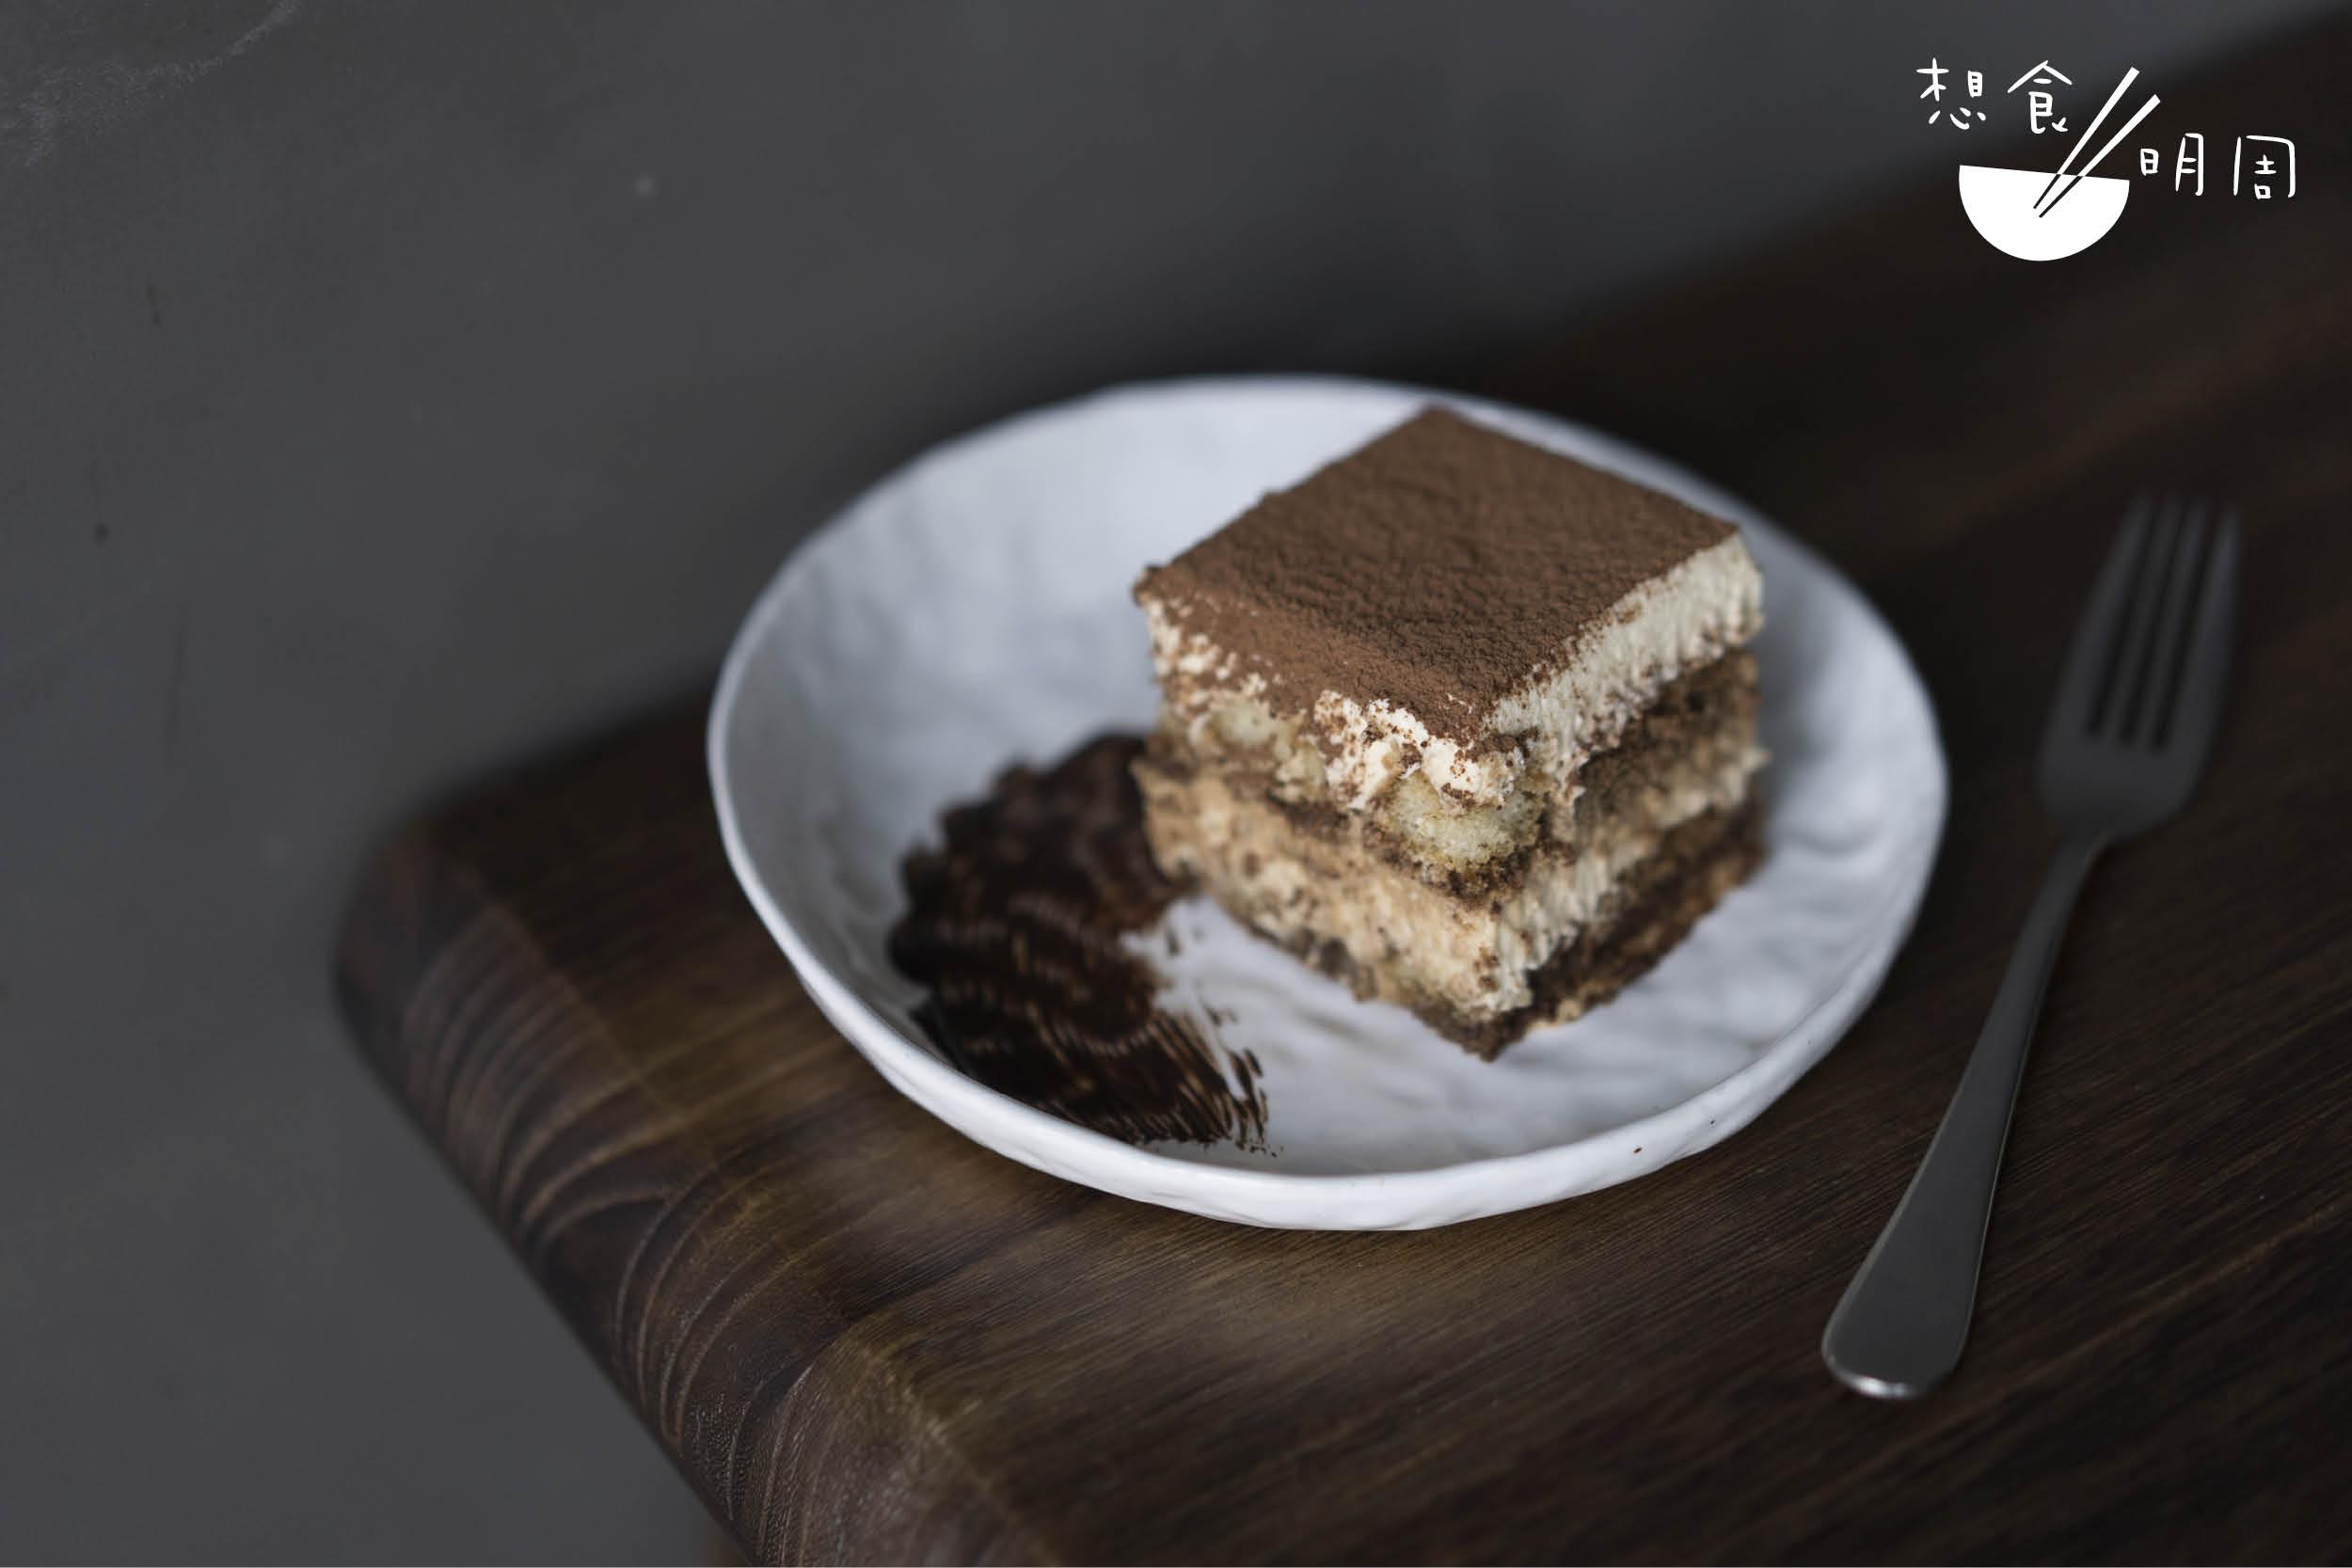 Tiramisu // 不敢說是全香港最好吃,但肯定是九龍城區的 Number 1。如像能食用咀嚼的咖啡,濃郁感滿滿地充斥在舌尖。($60)